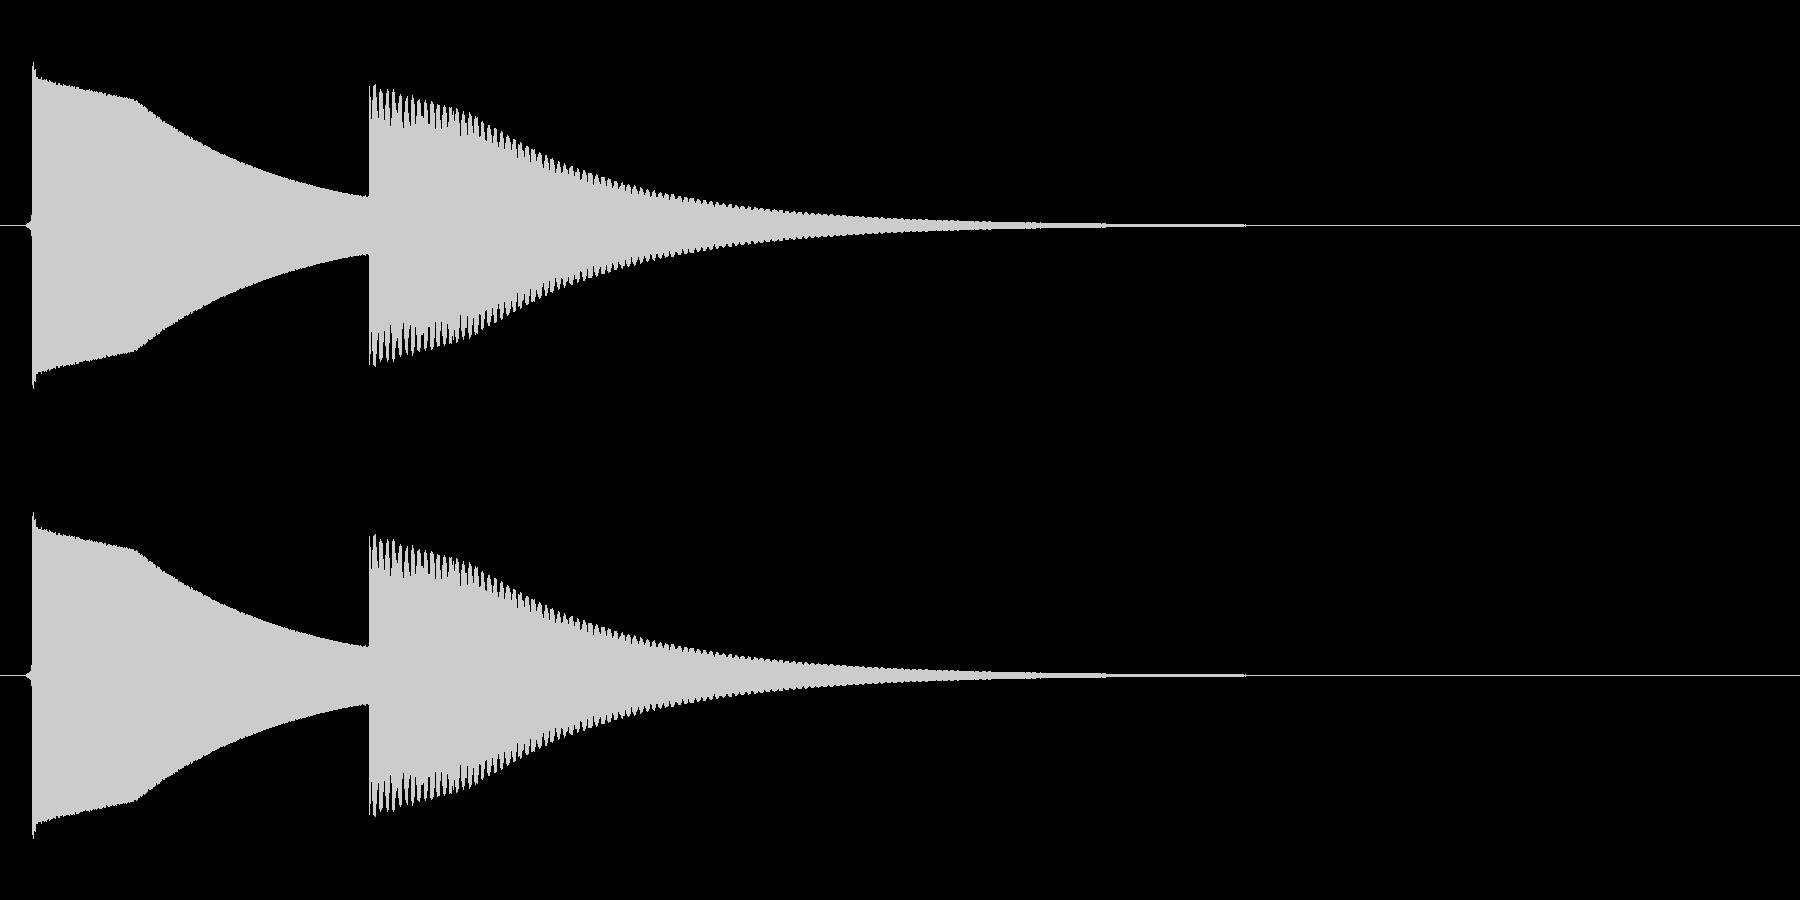 【SE】正解04(ピンポーン 長め)の未再生の波形